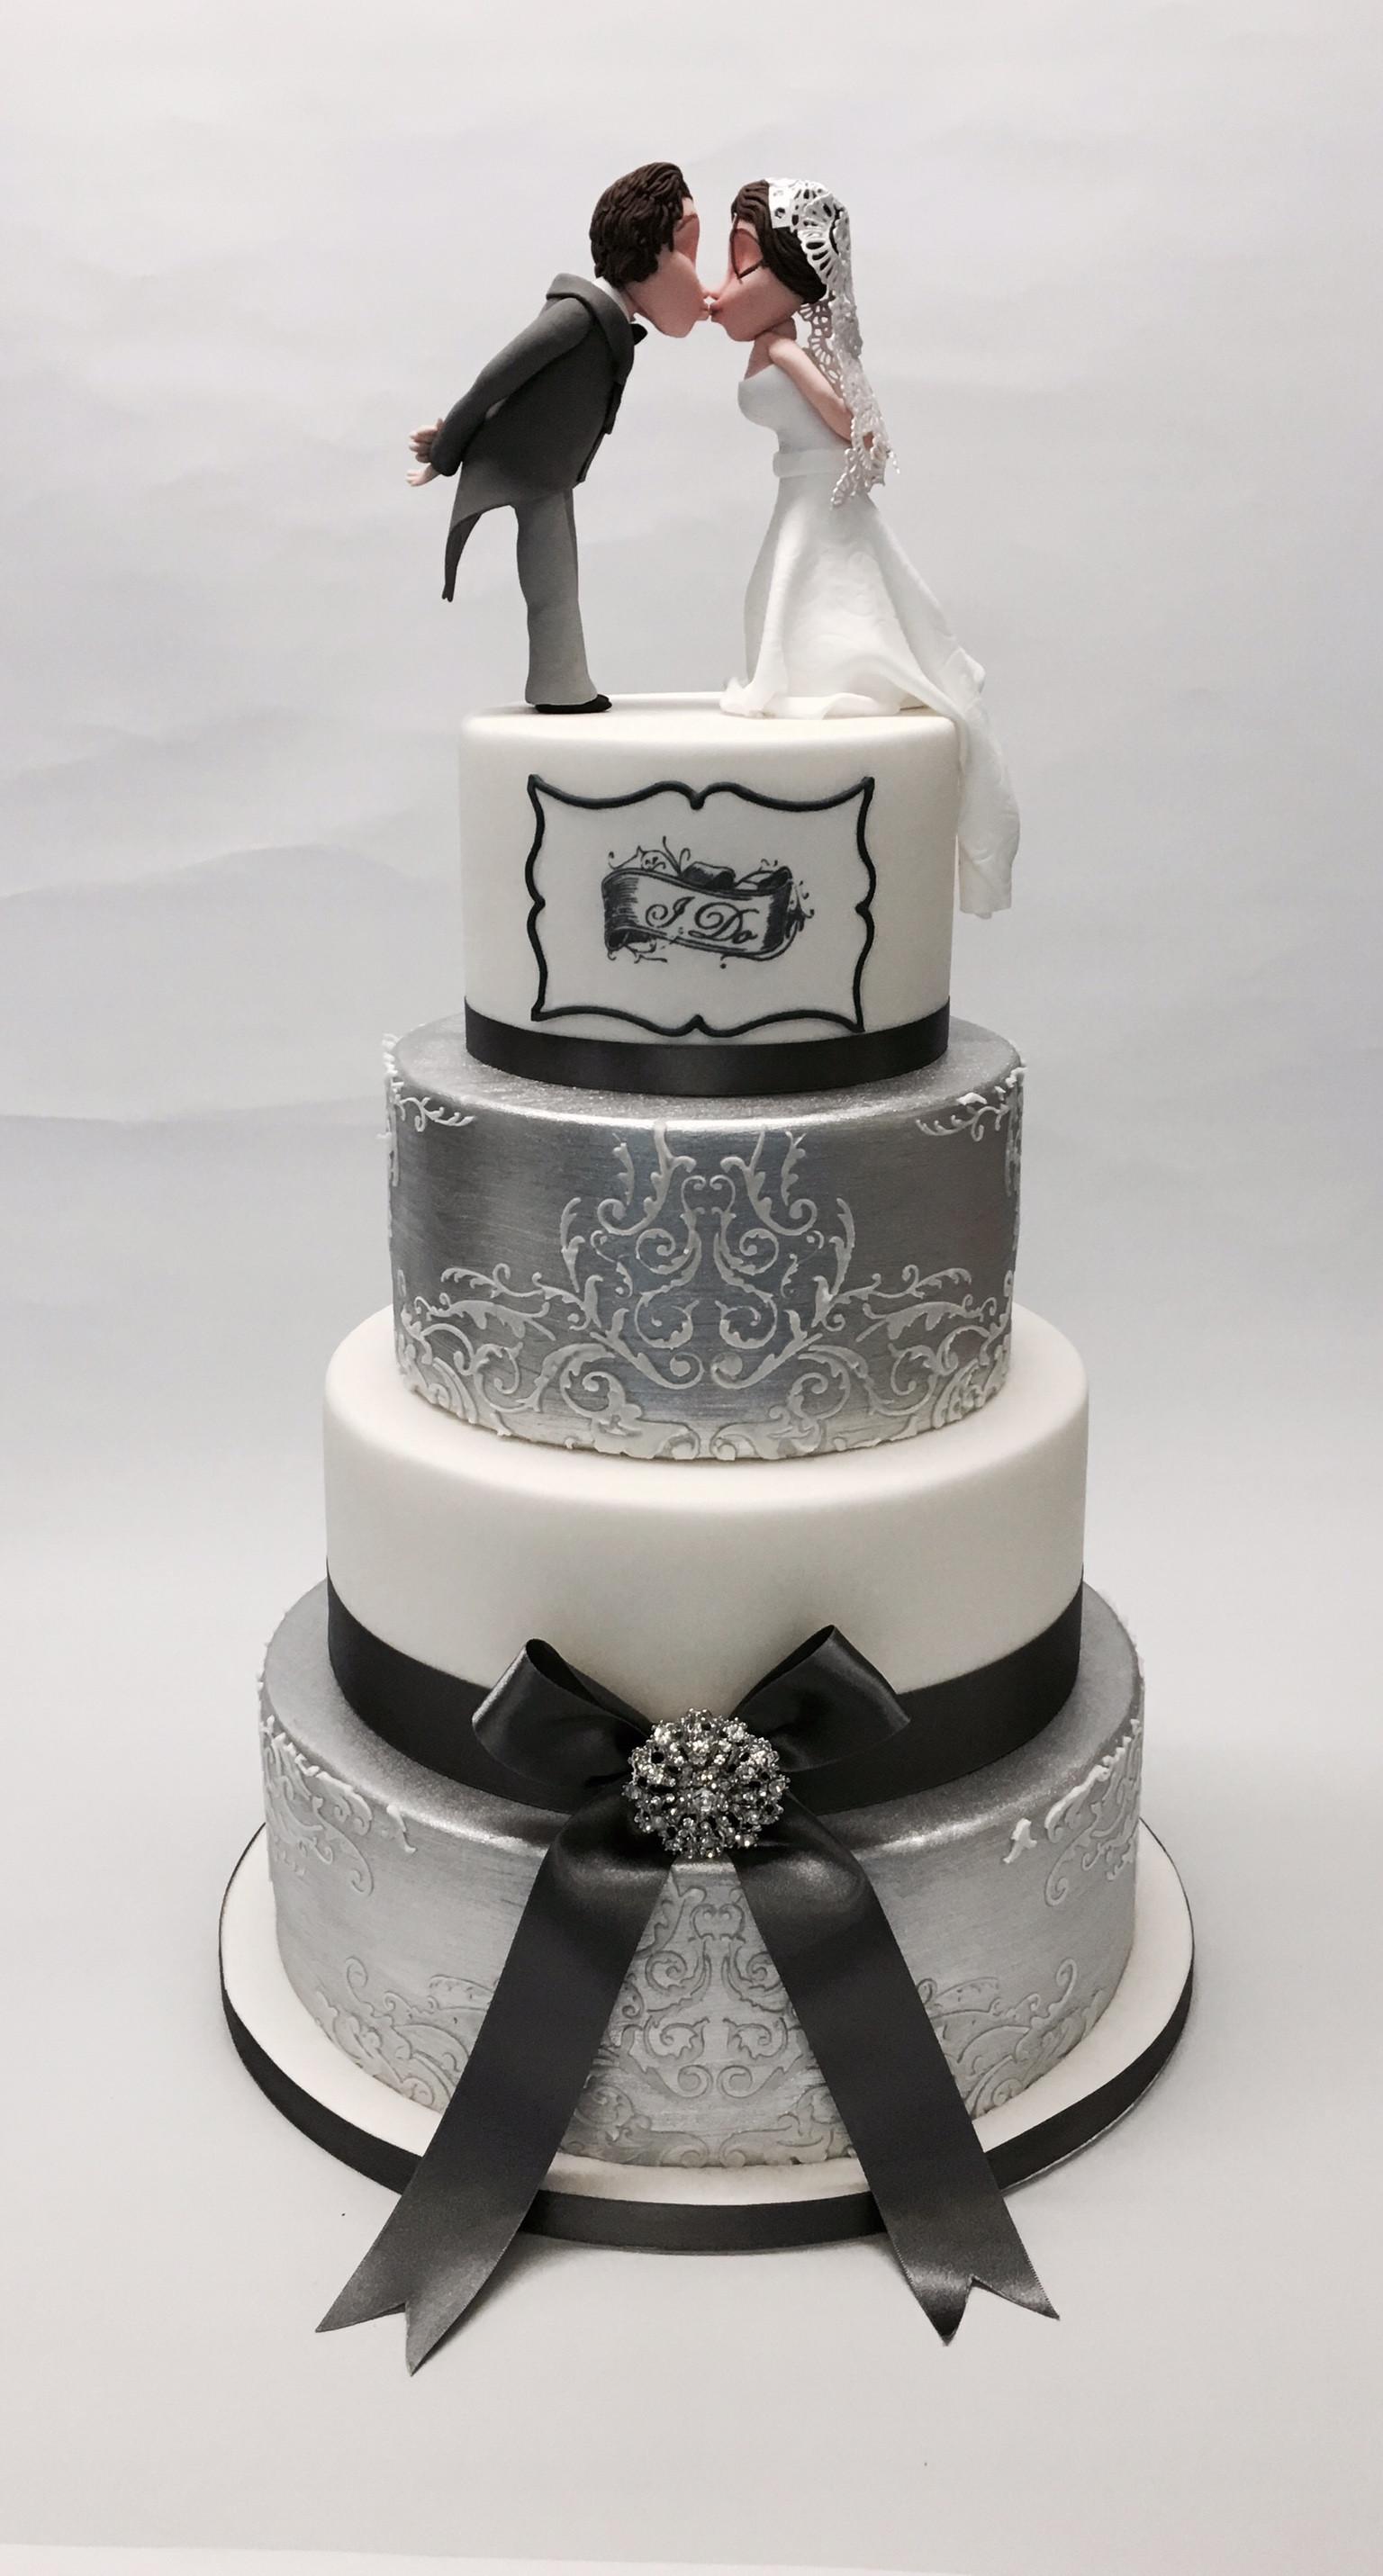 I Do Wedding Cakes  4 Tier Silver and White I Do Wedding Cake Wedding